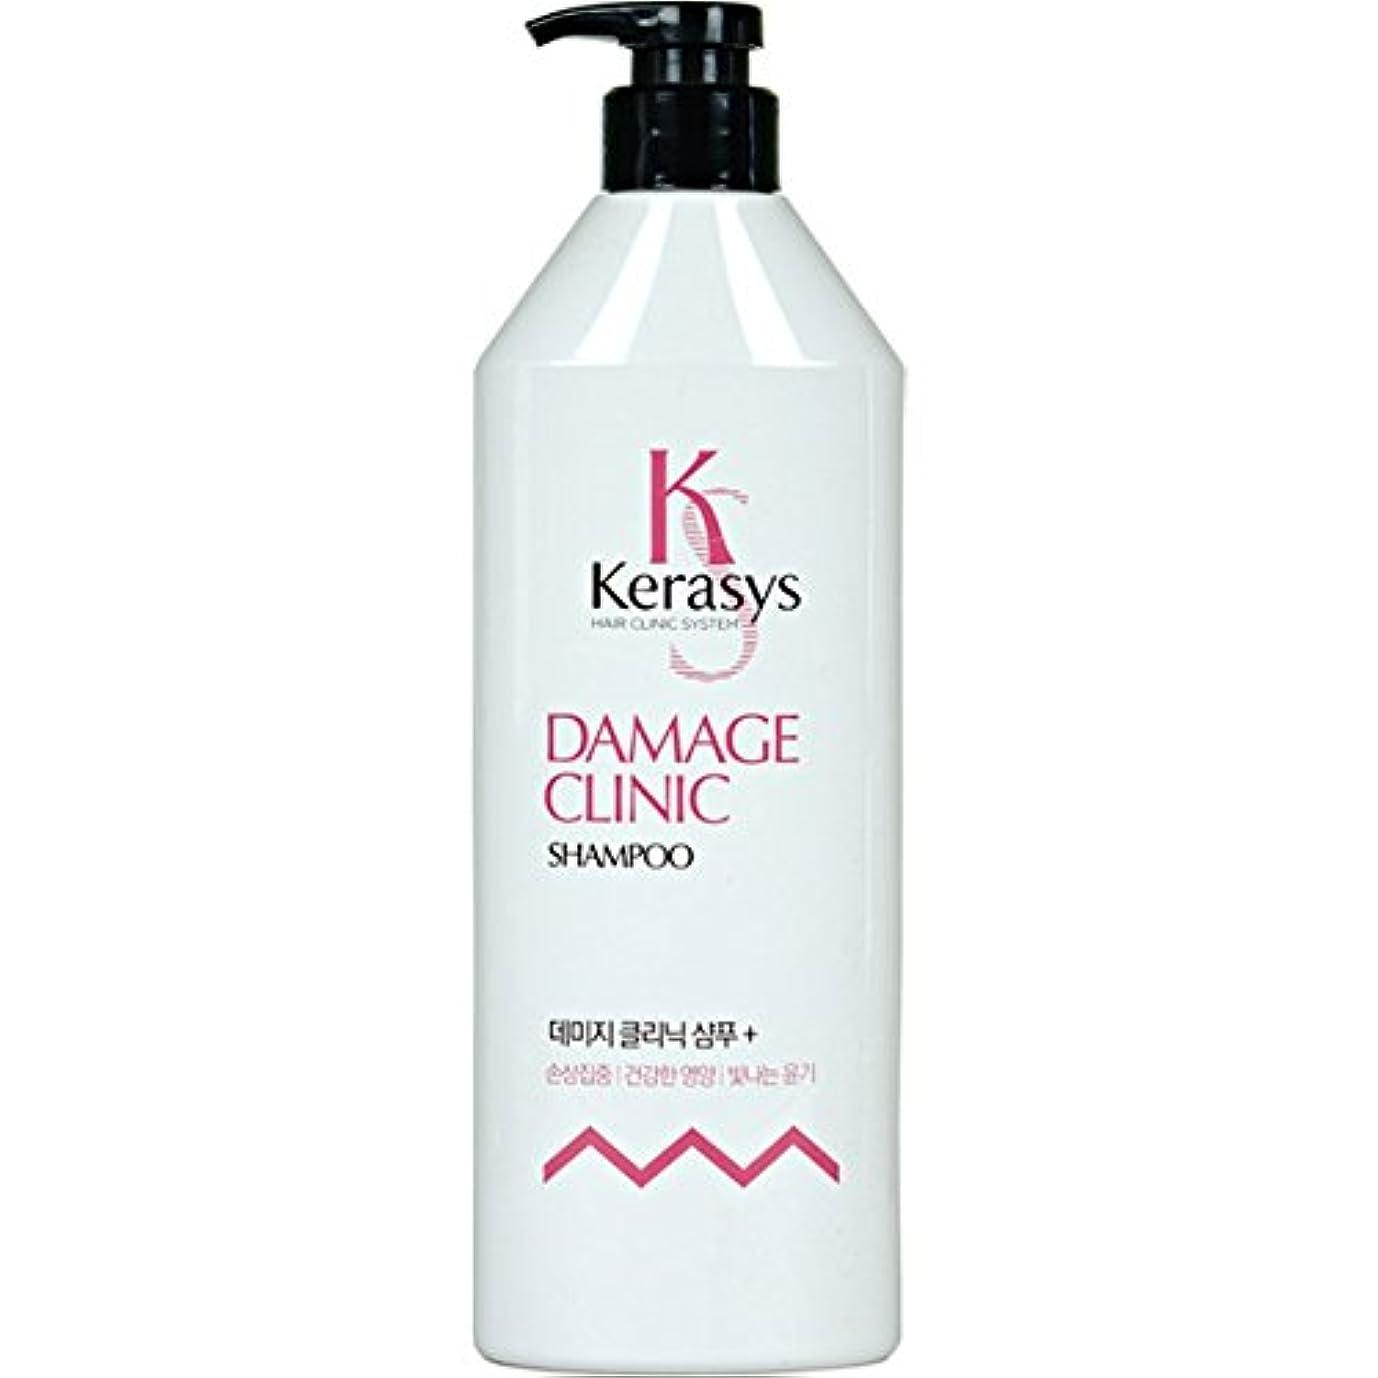 [Kerasys] ケラシス ダメージクリニック シャンプー 750ml Damage Clinic Shampoo [海外直送品]